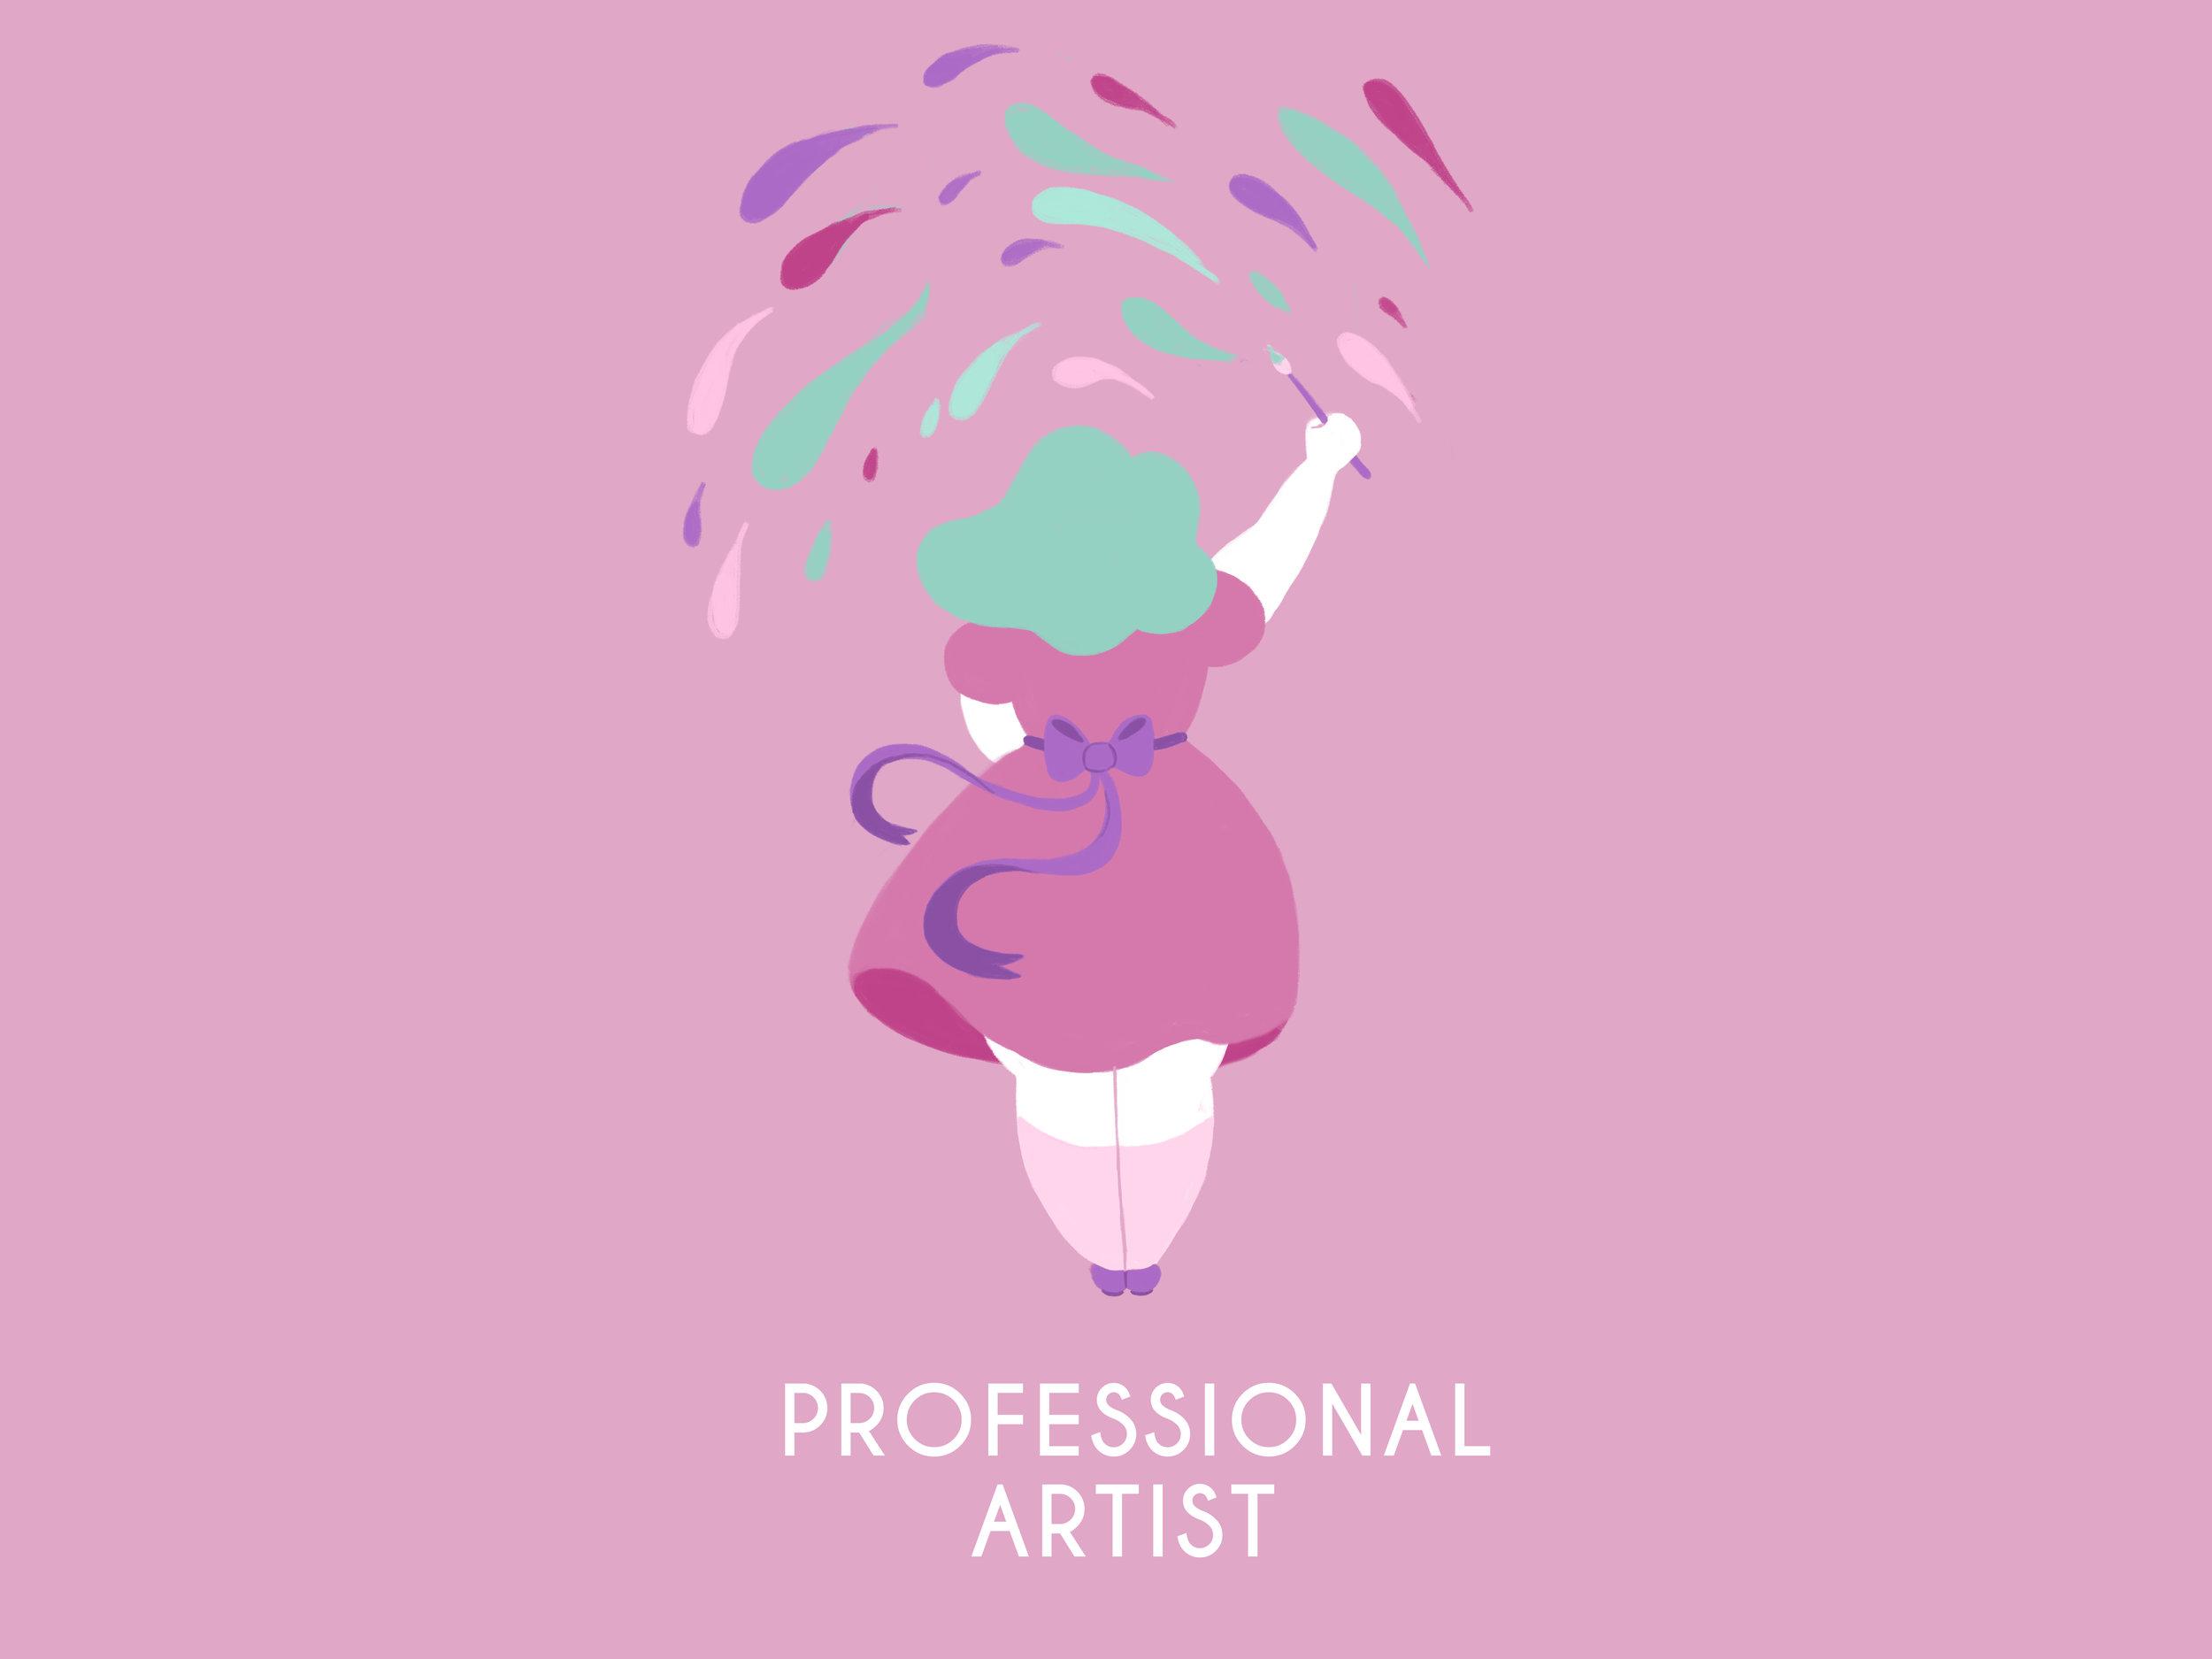 PROFESSIONAL ARTIST.jpg